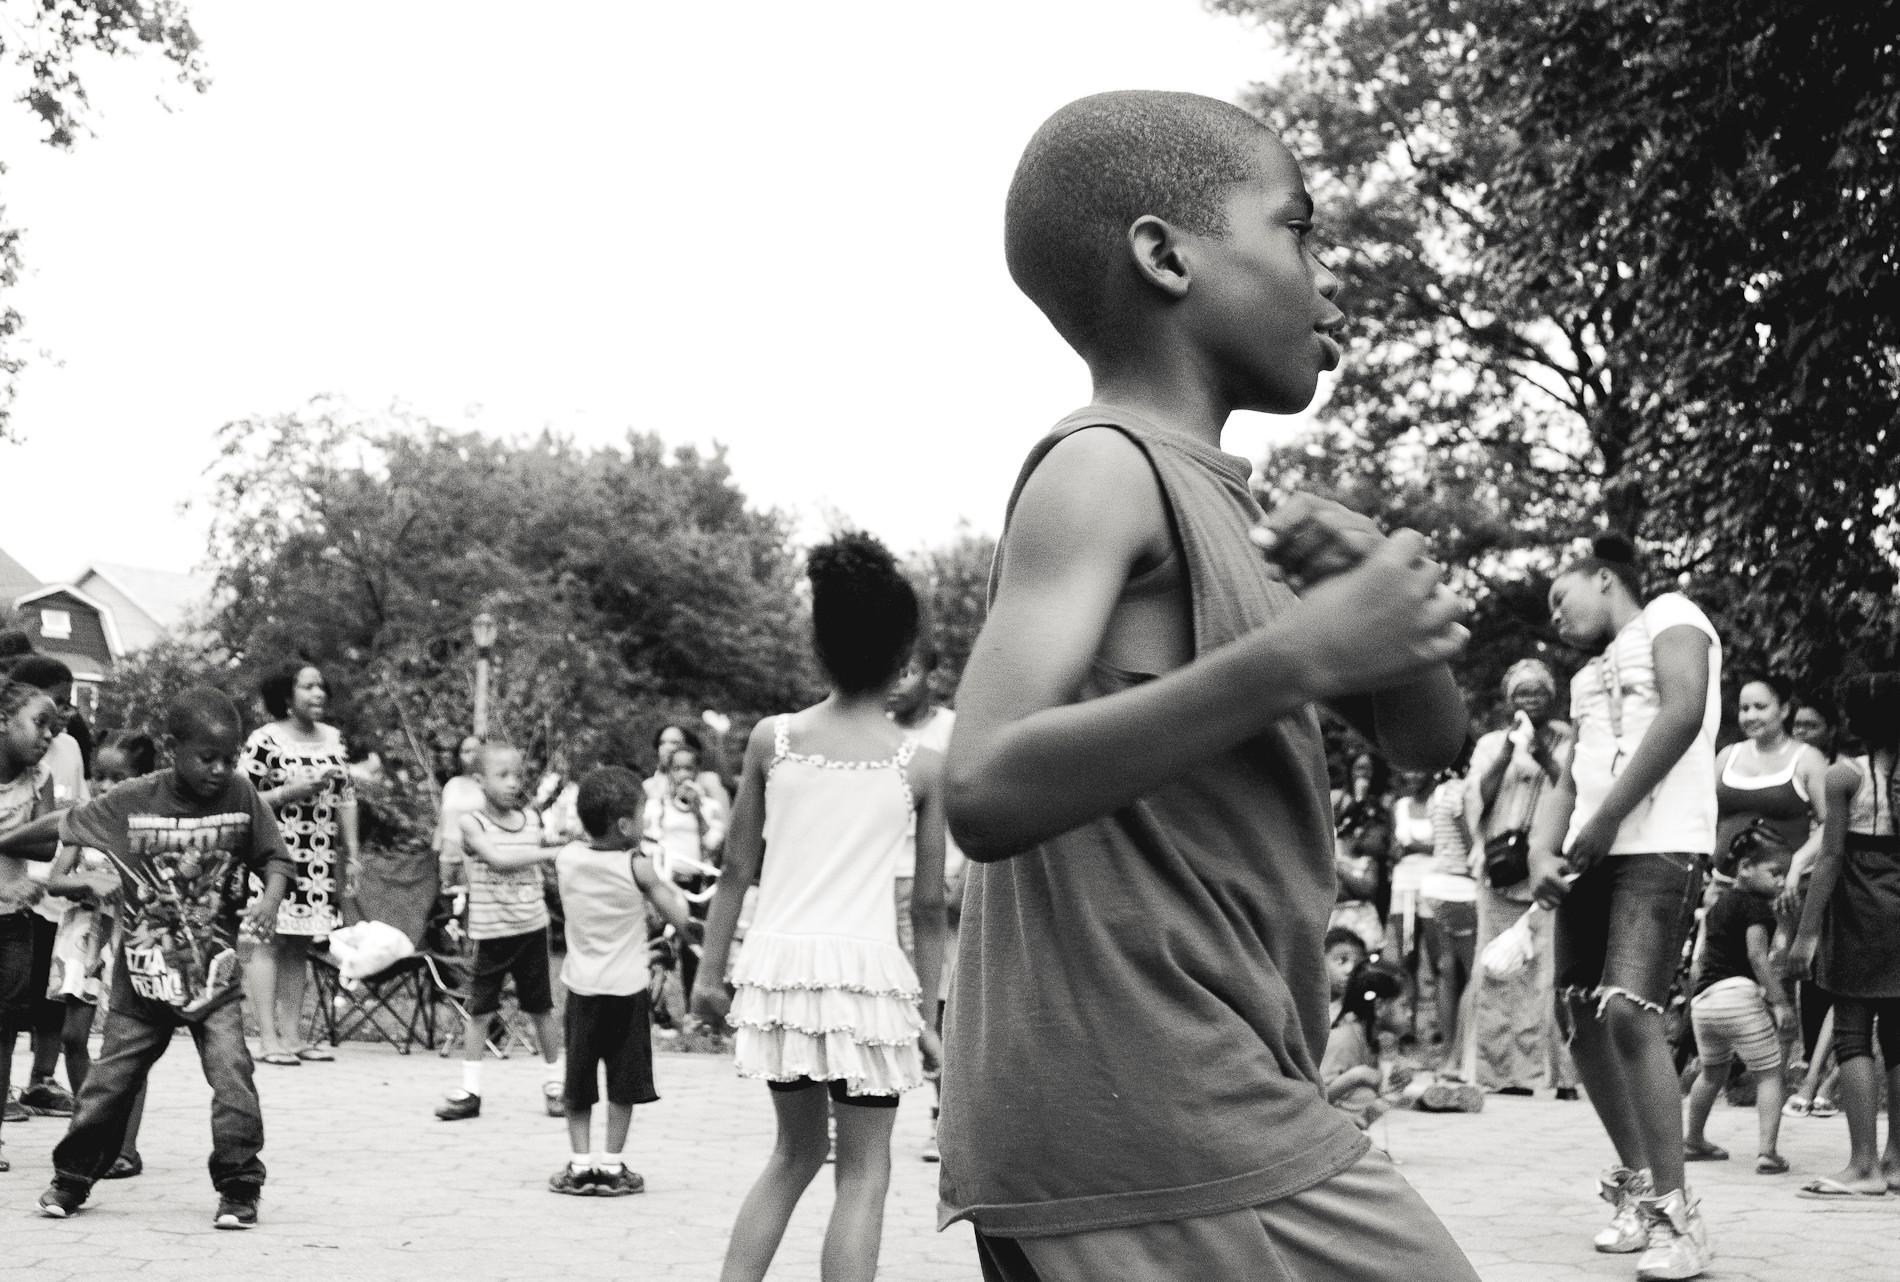 Dancing in Flatbush.